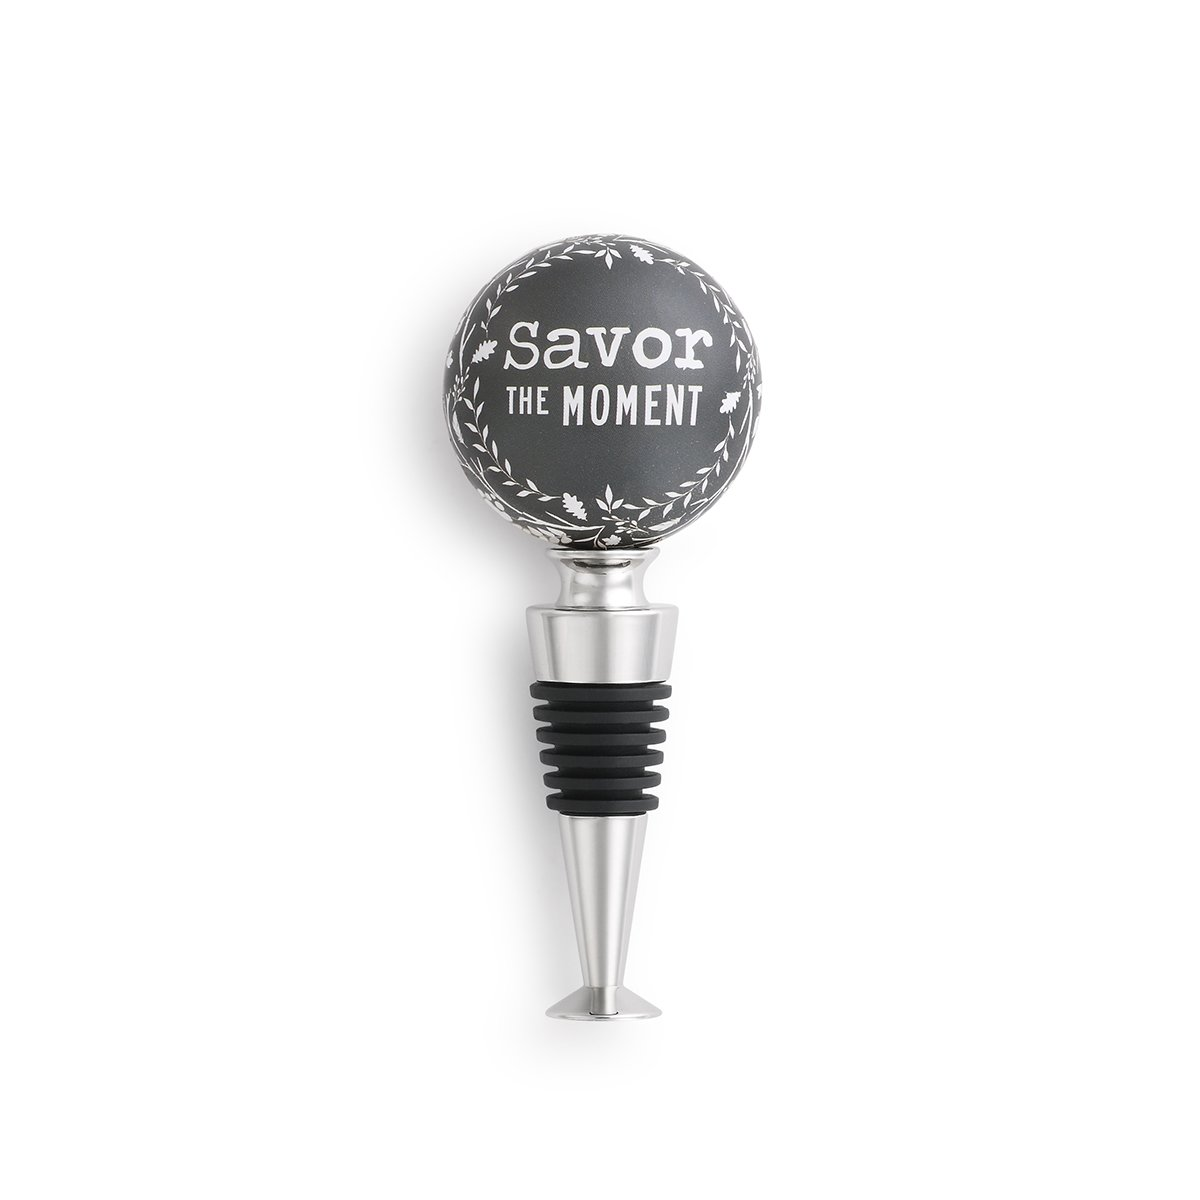 Demdaco 1004180175 Bottle Stopper Black